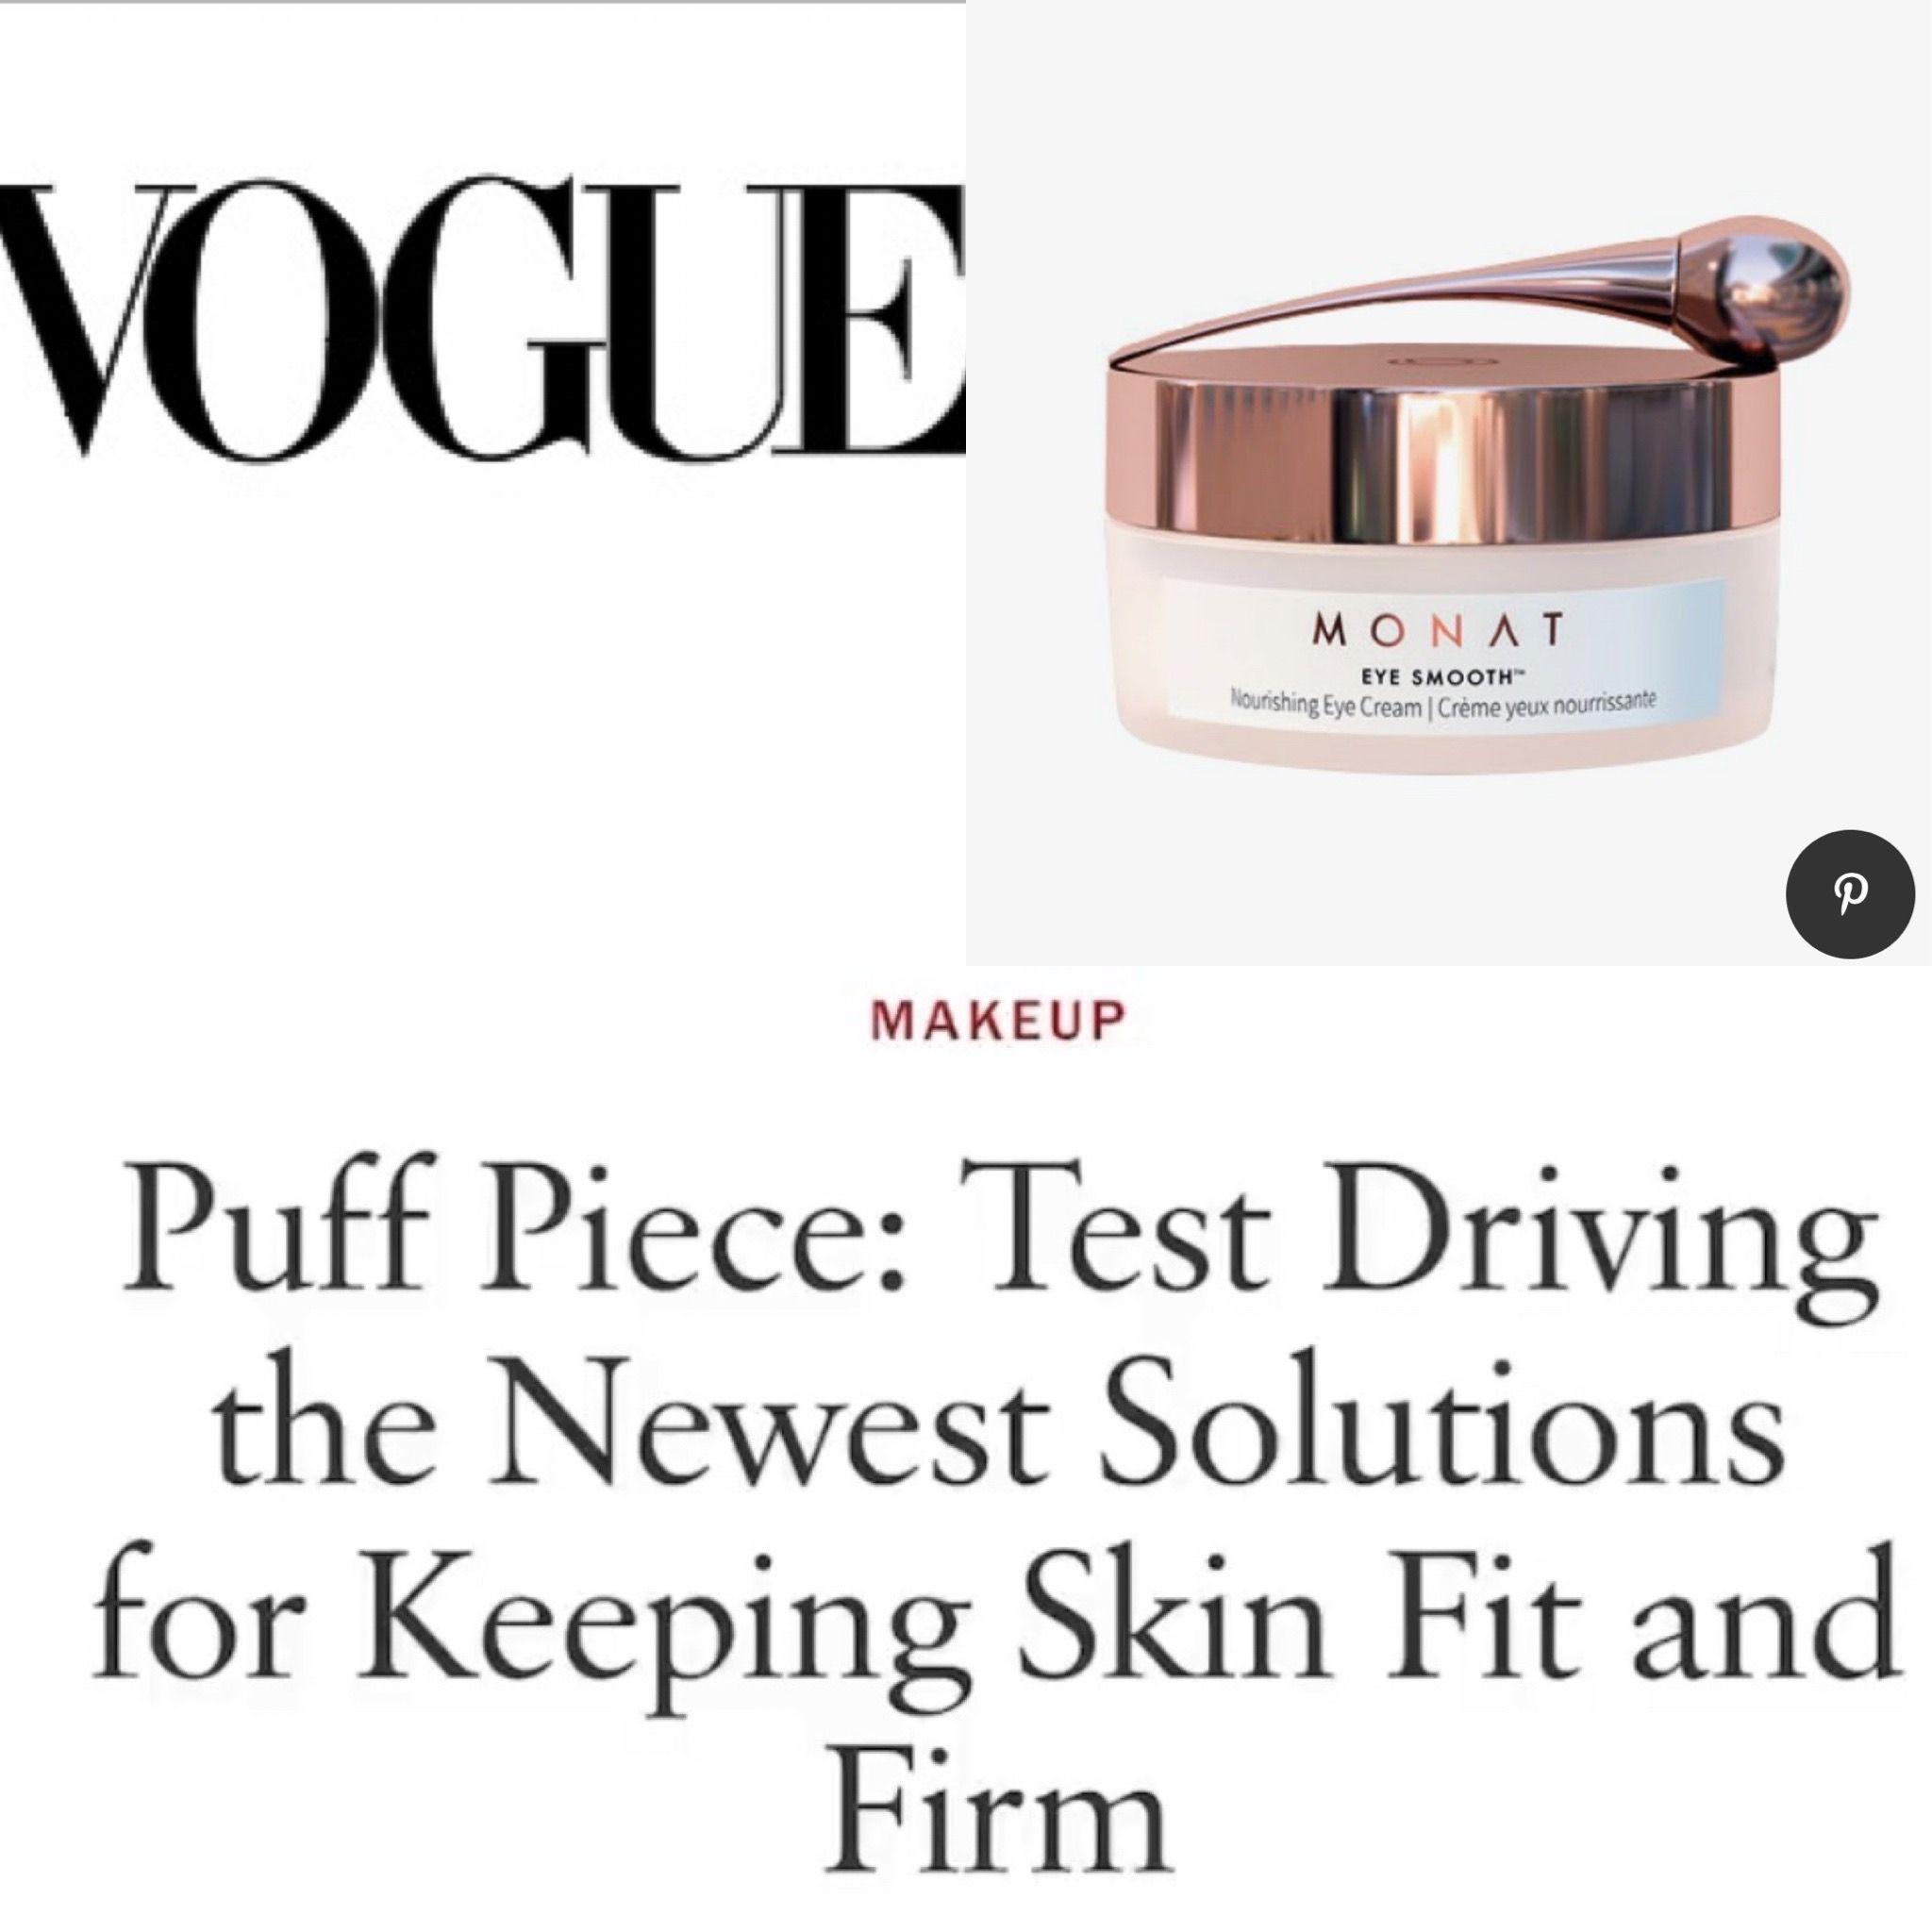 Monat Skincare In Vogue Magazine In 2020 Monat Anti Aging Skin